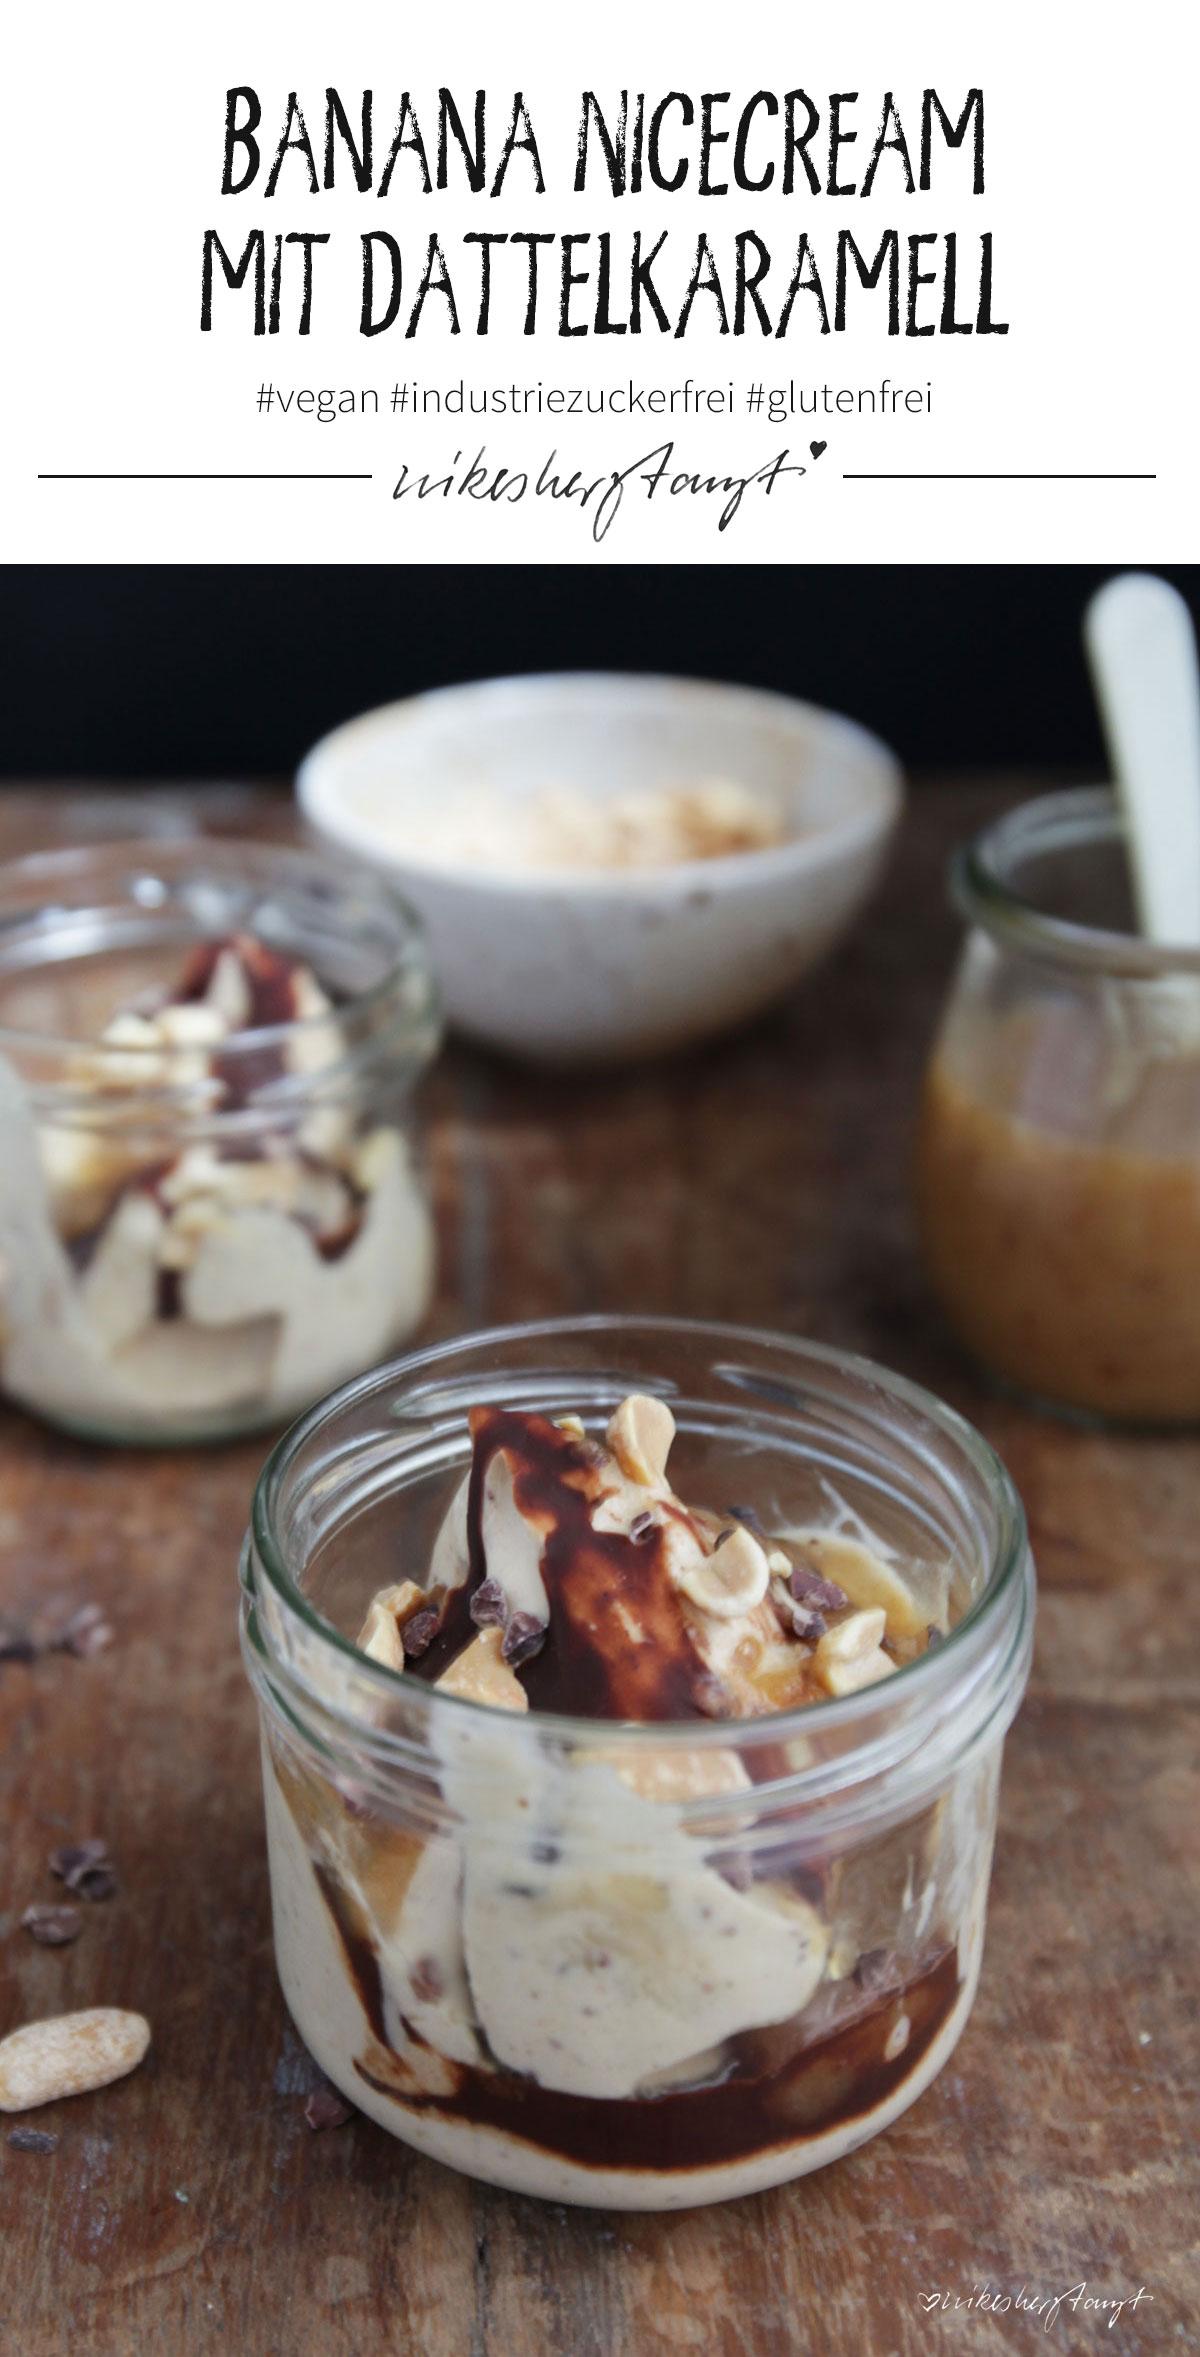 Banana NiceCream mit Dattelkaramell, Erdnüssen & Schokolade // nikesherztanzt